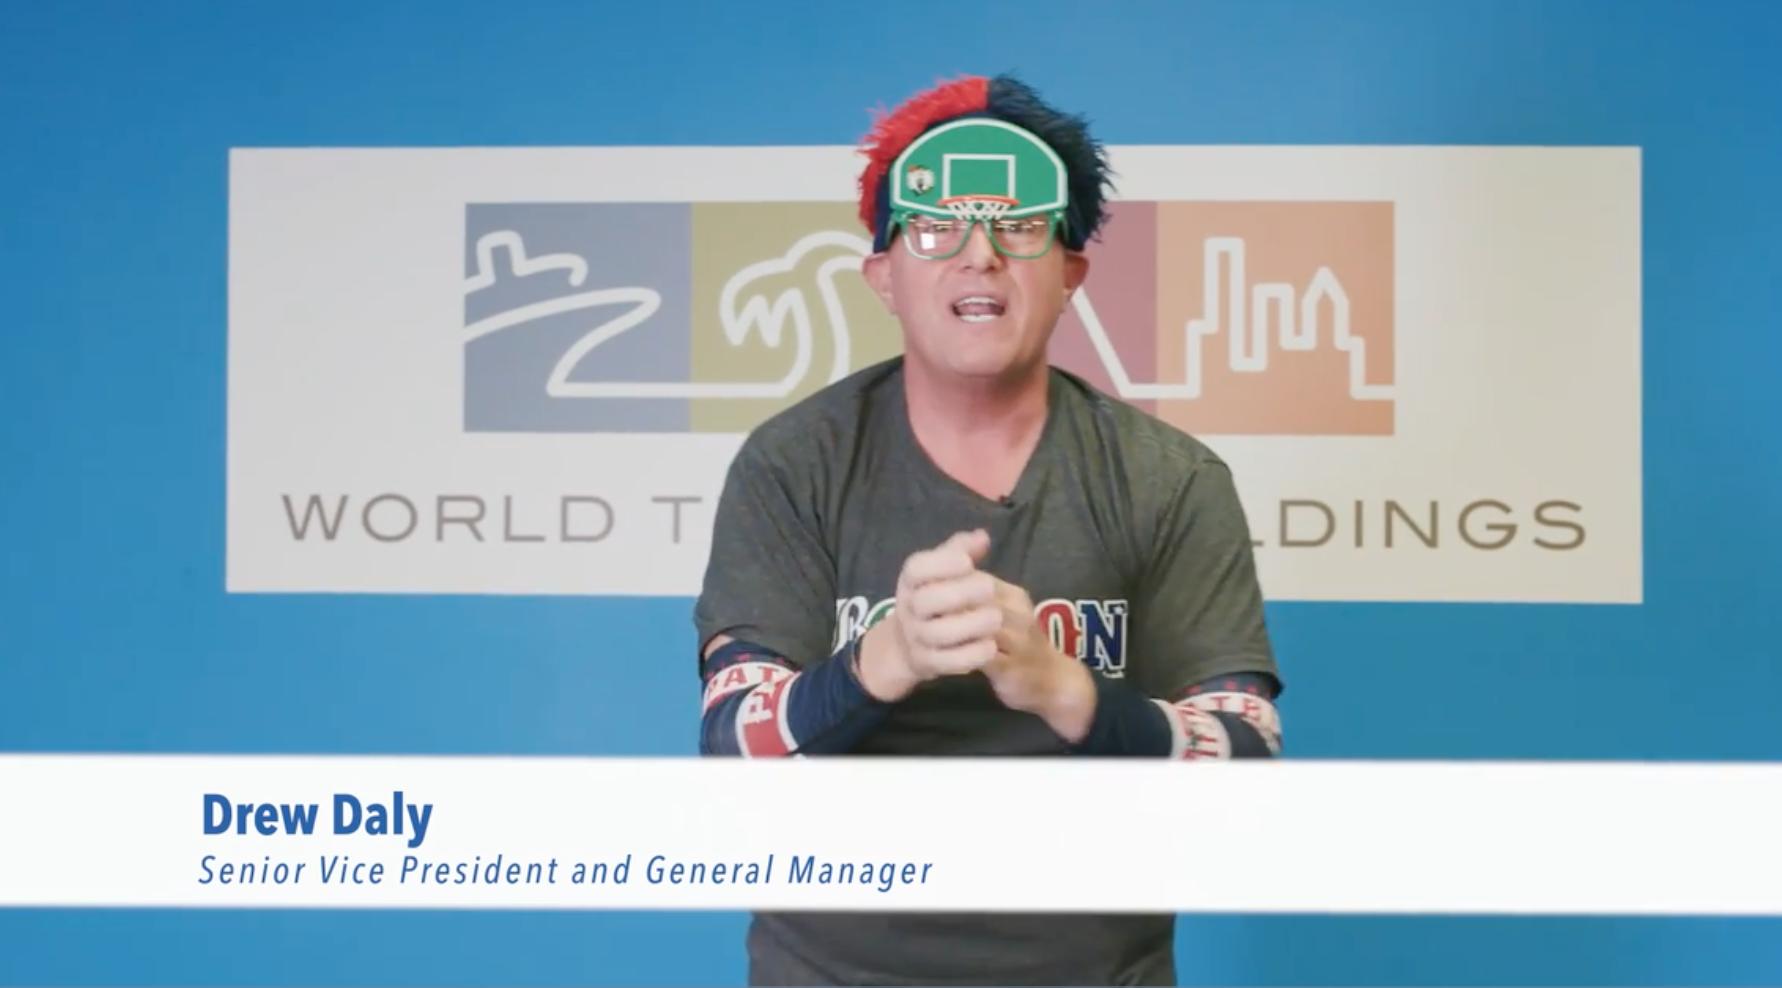 Drew Daly Vision 2020